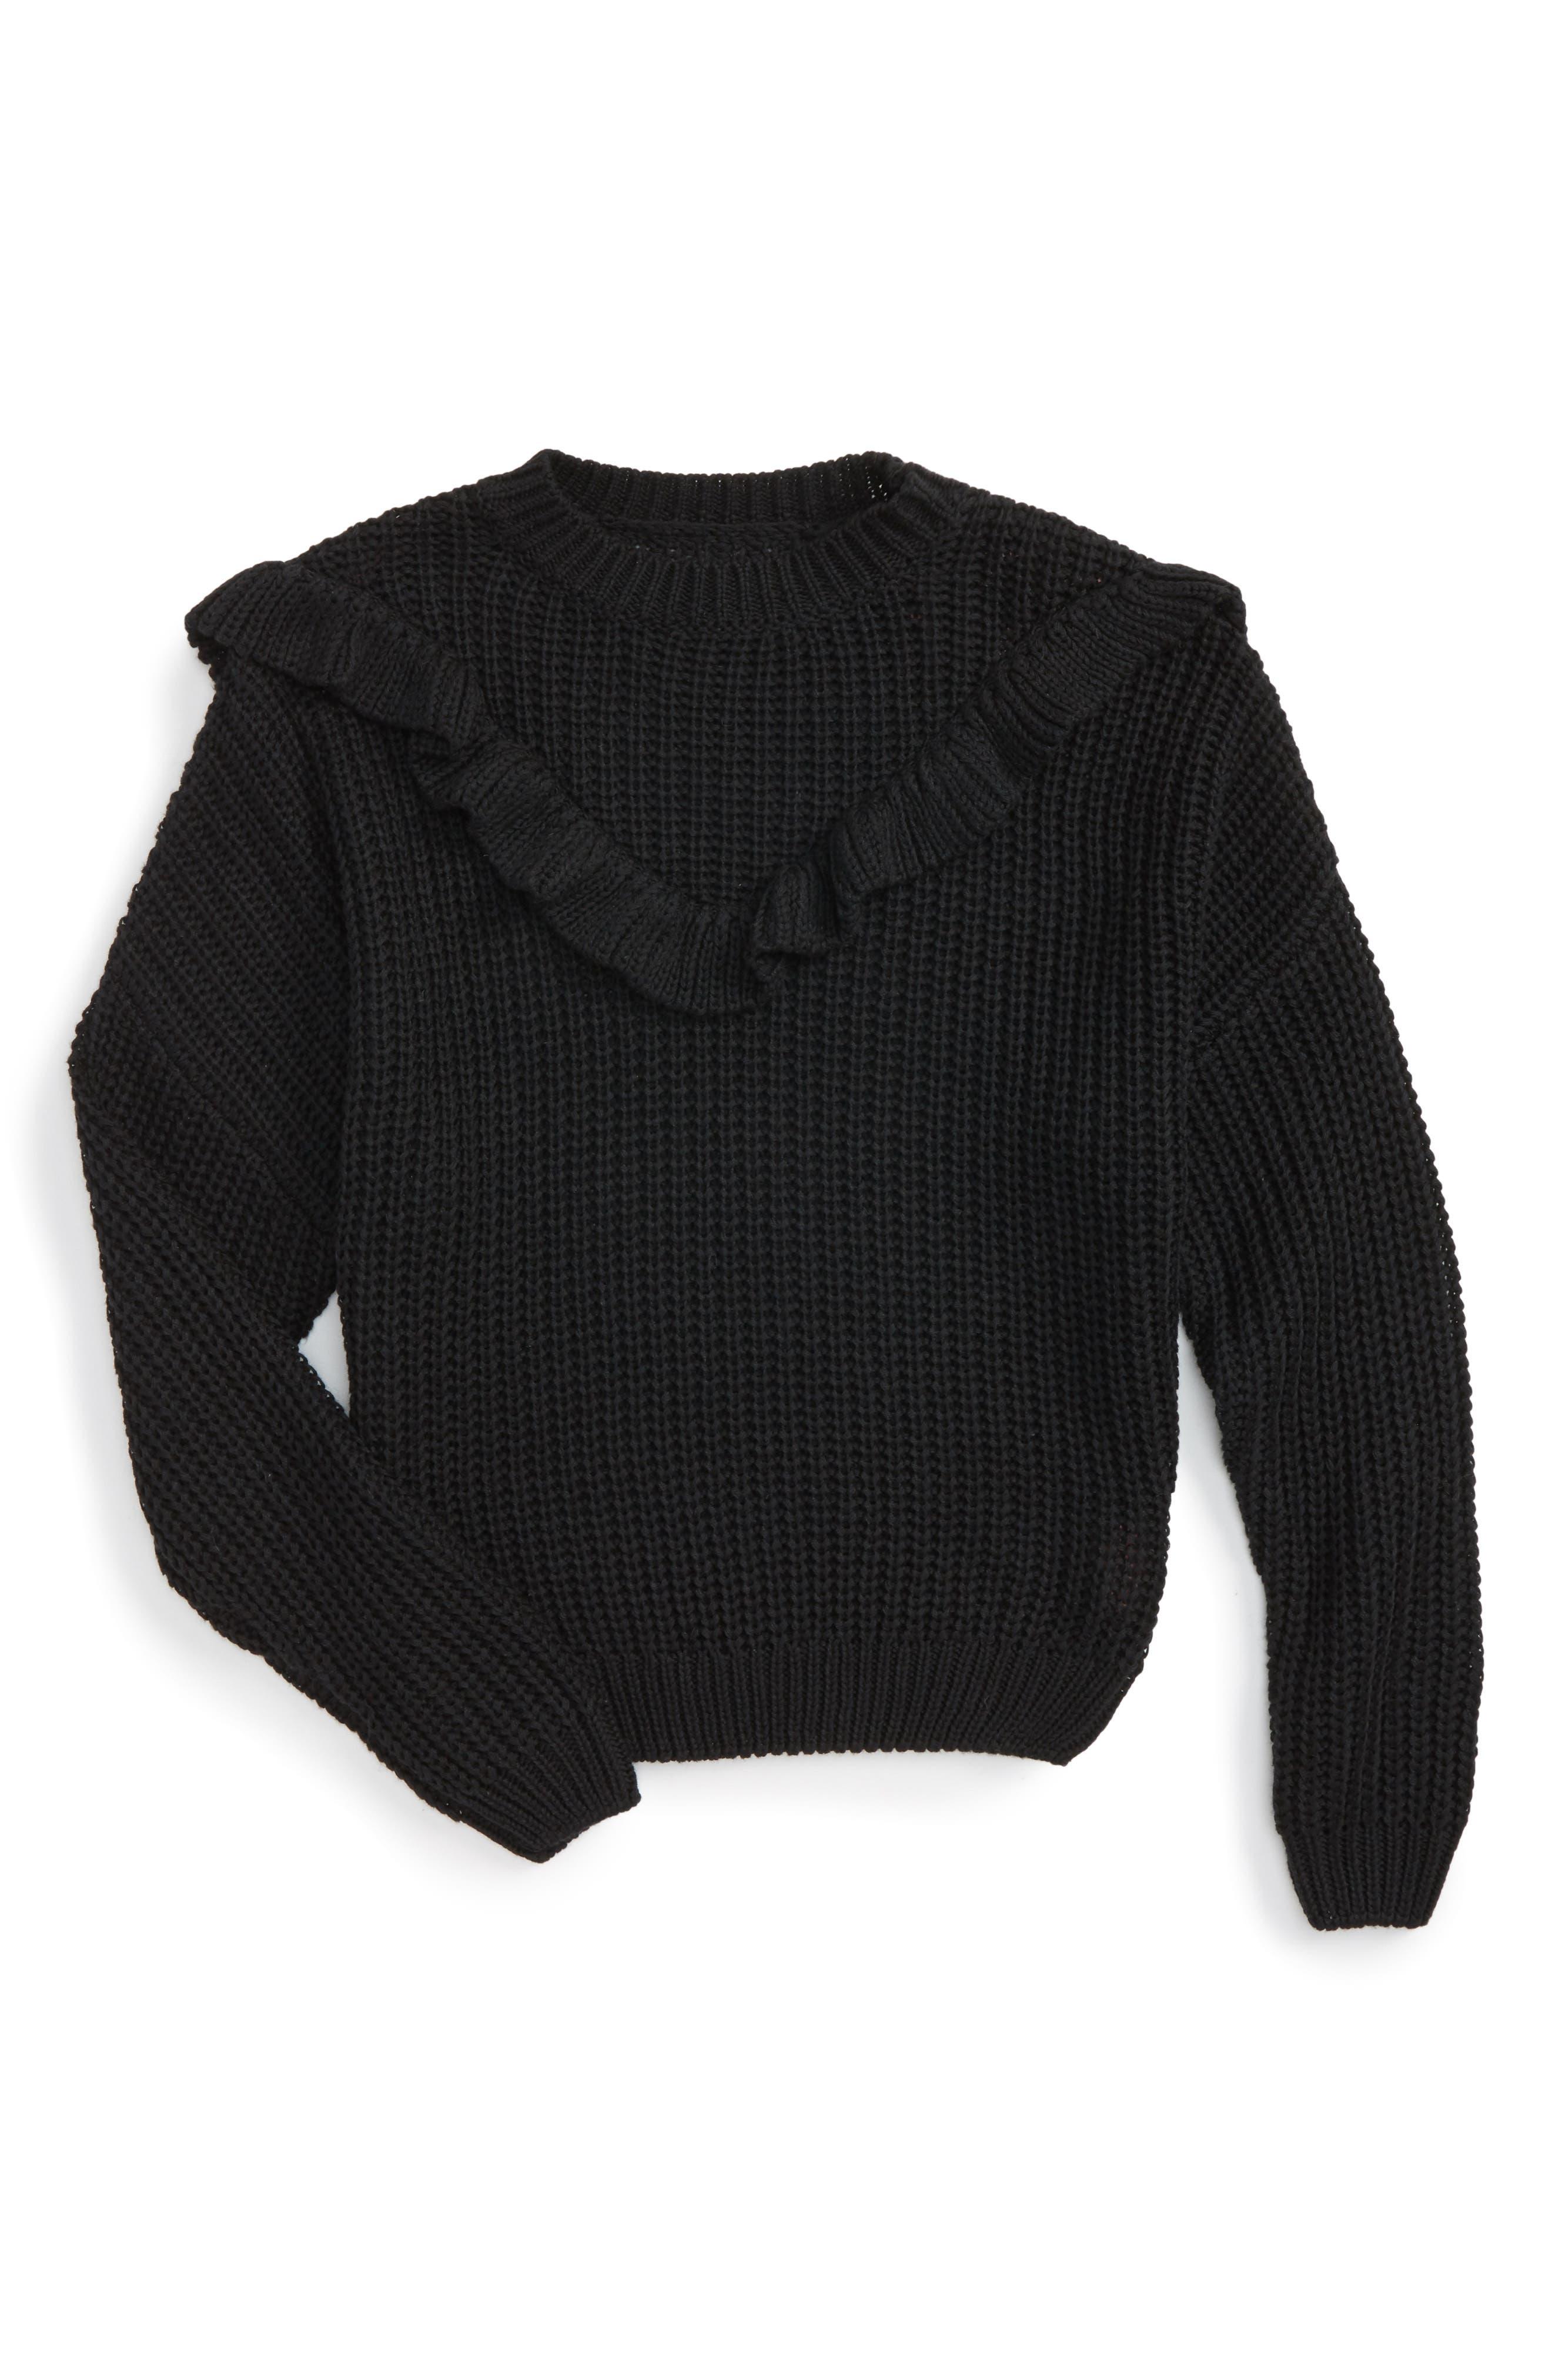 BLANCNYC Ruffle Sweater,                             Main thumbnail 1, color,